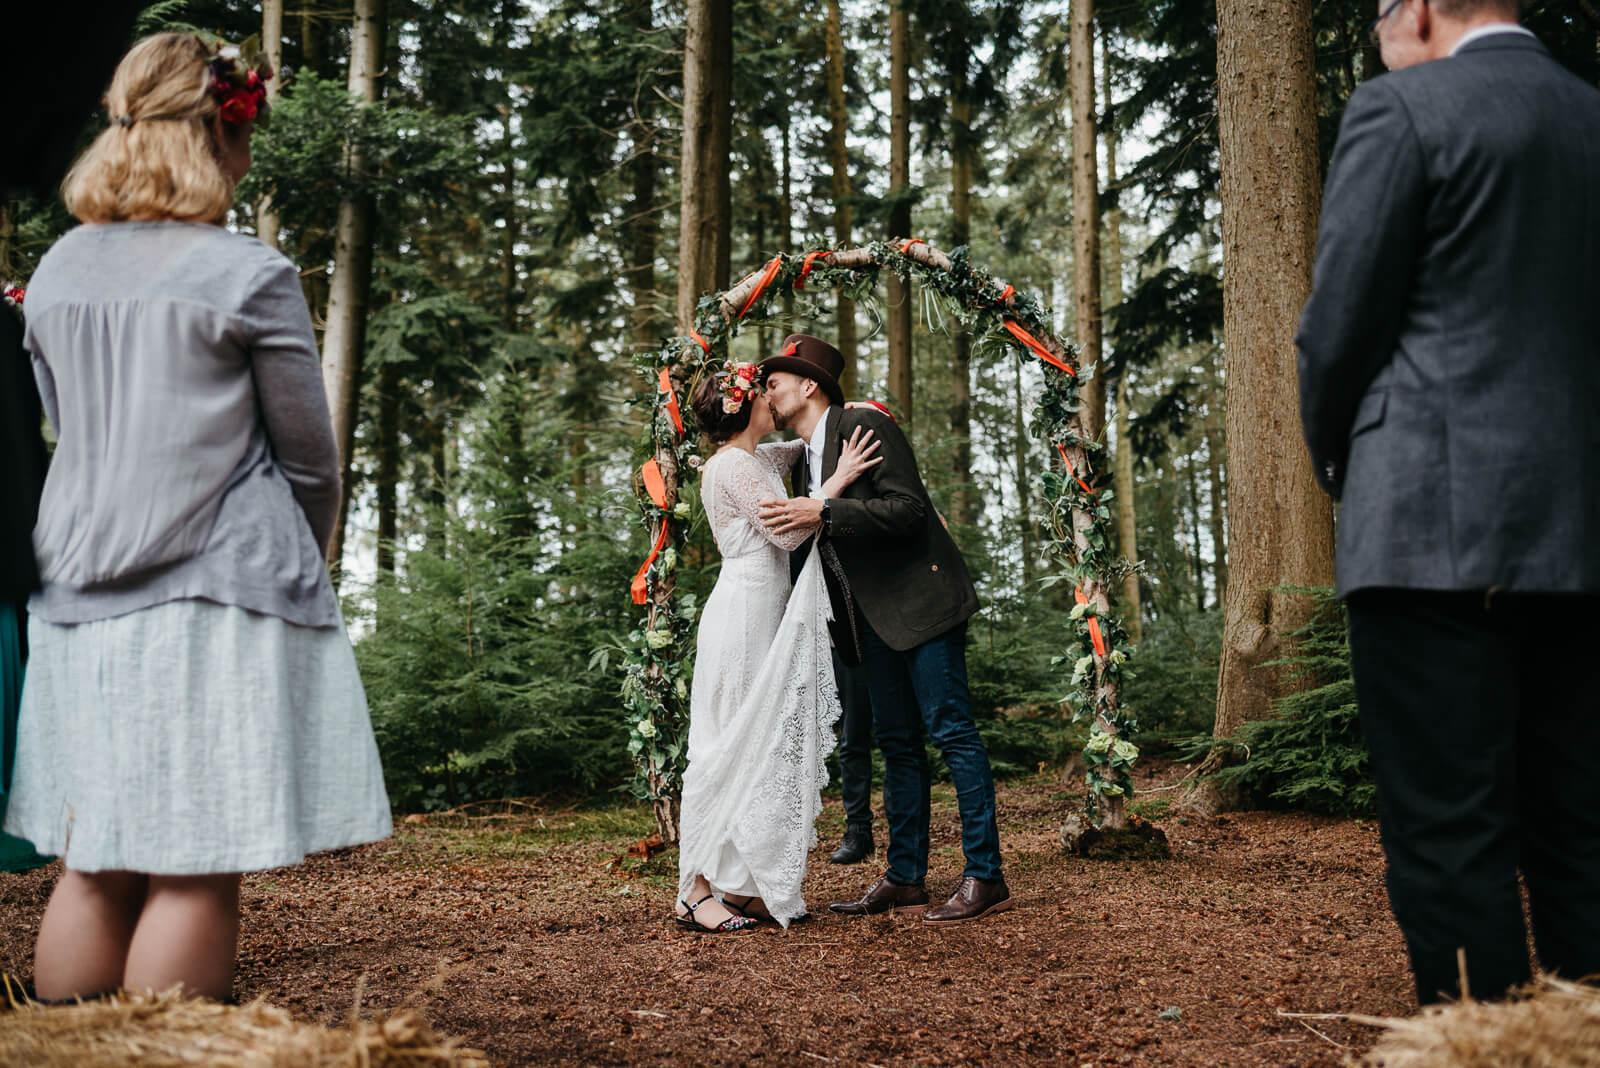 Woodland Wedding Photography: Woodland Wedding In The New Forest